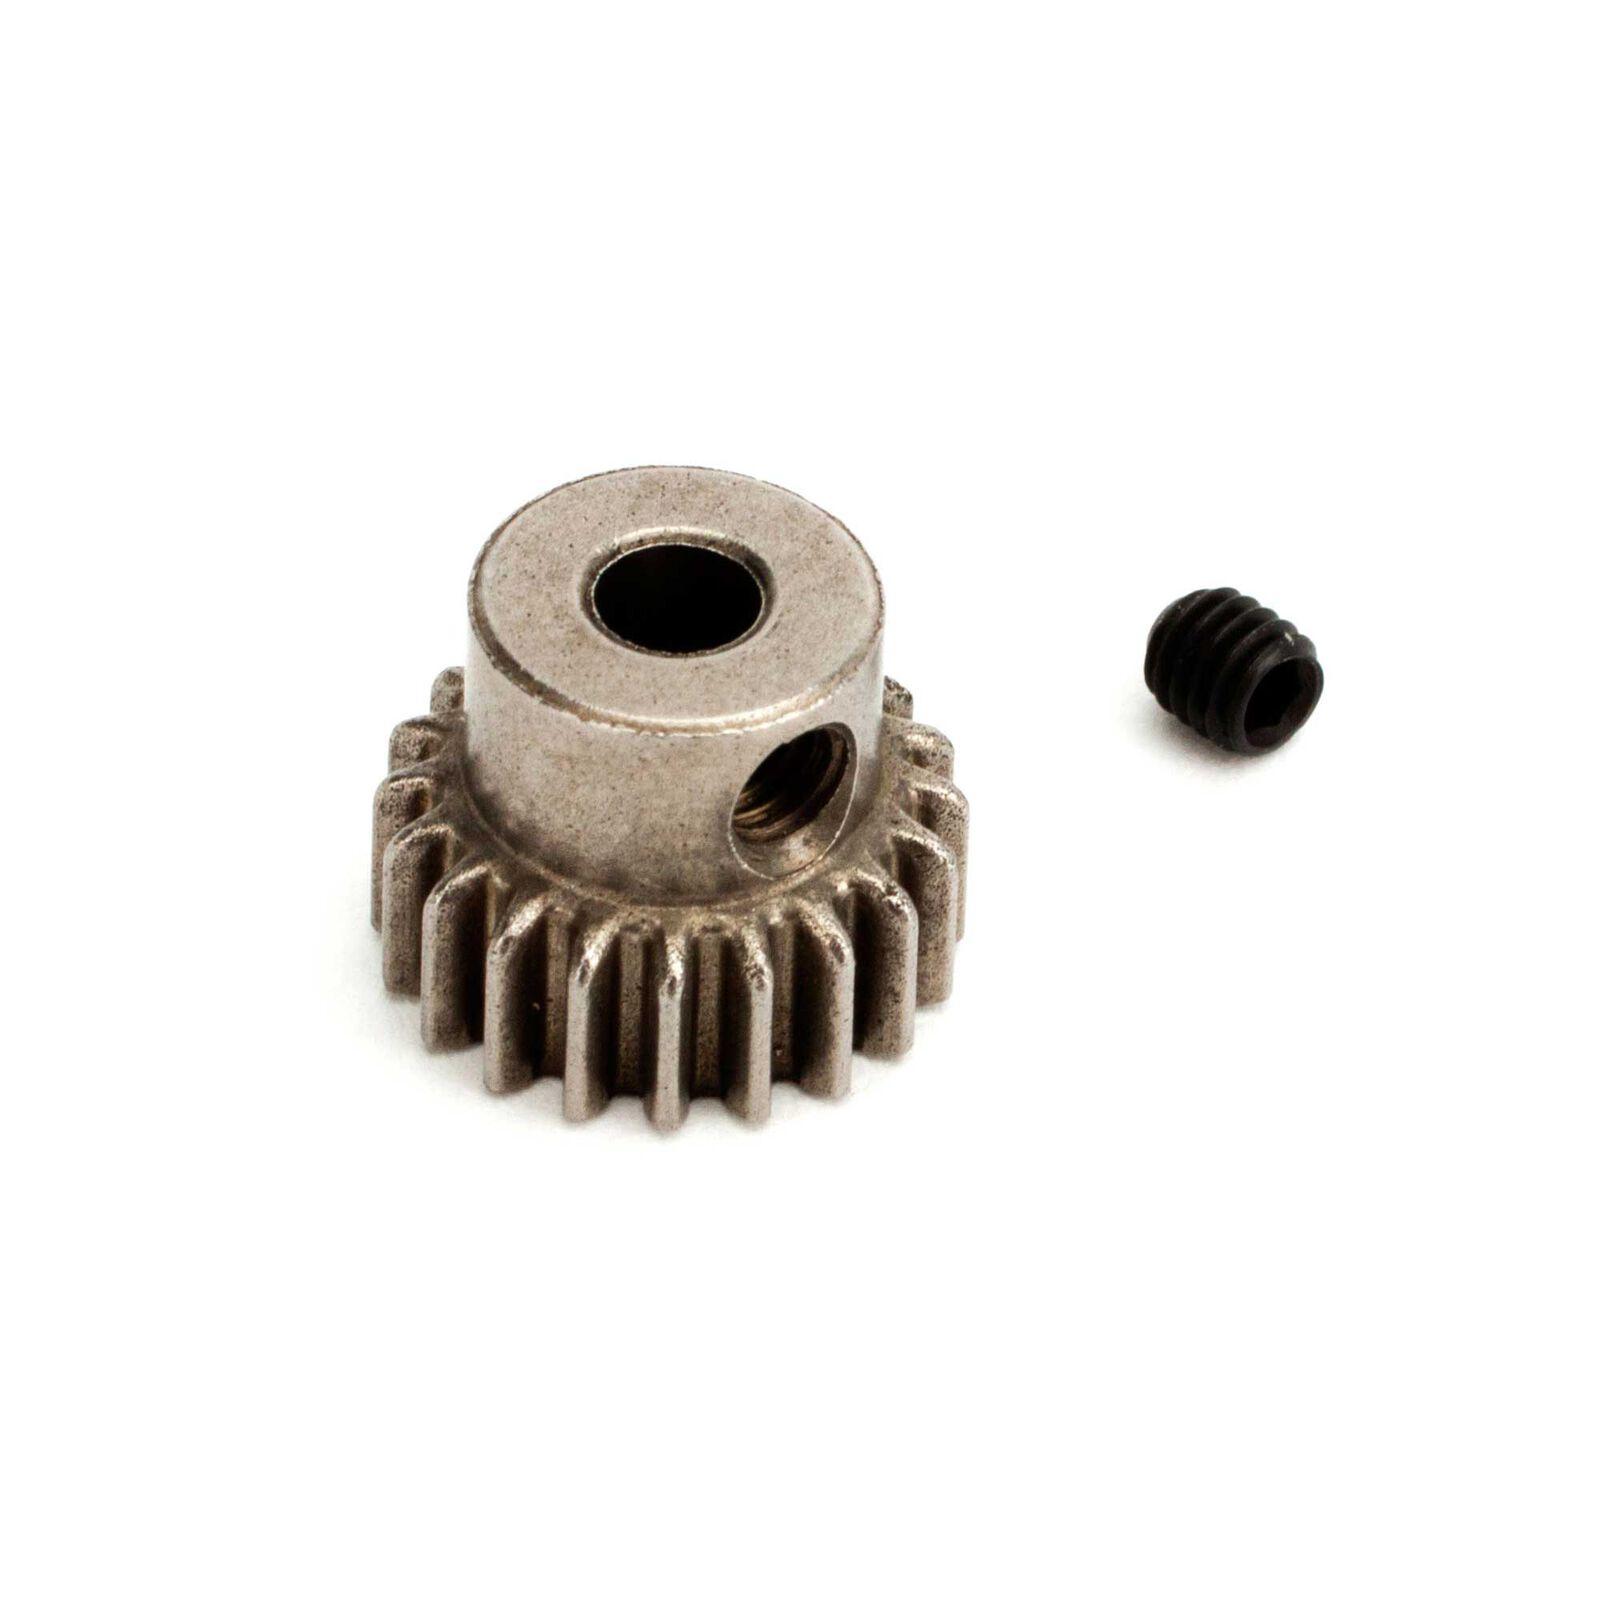 48P Pinion Gear, 20T